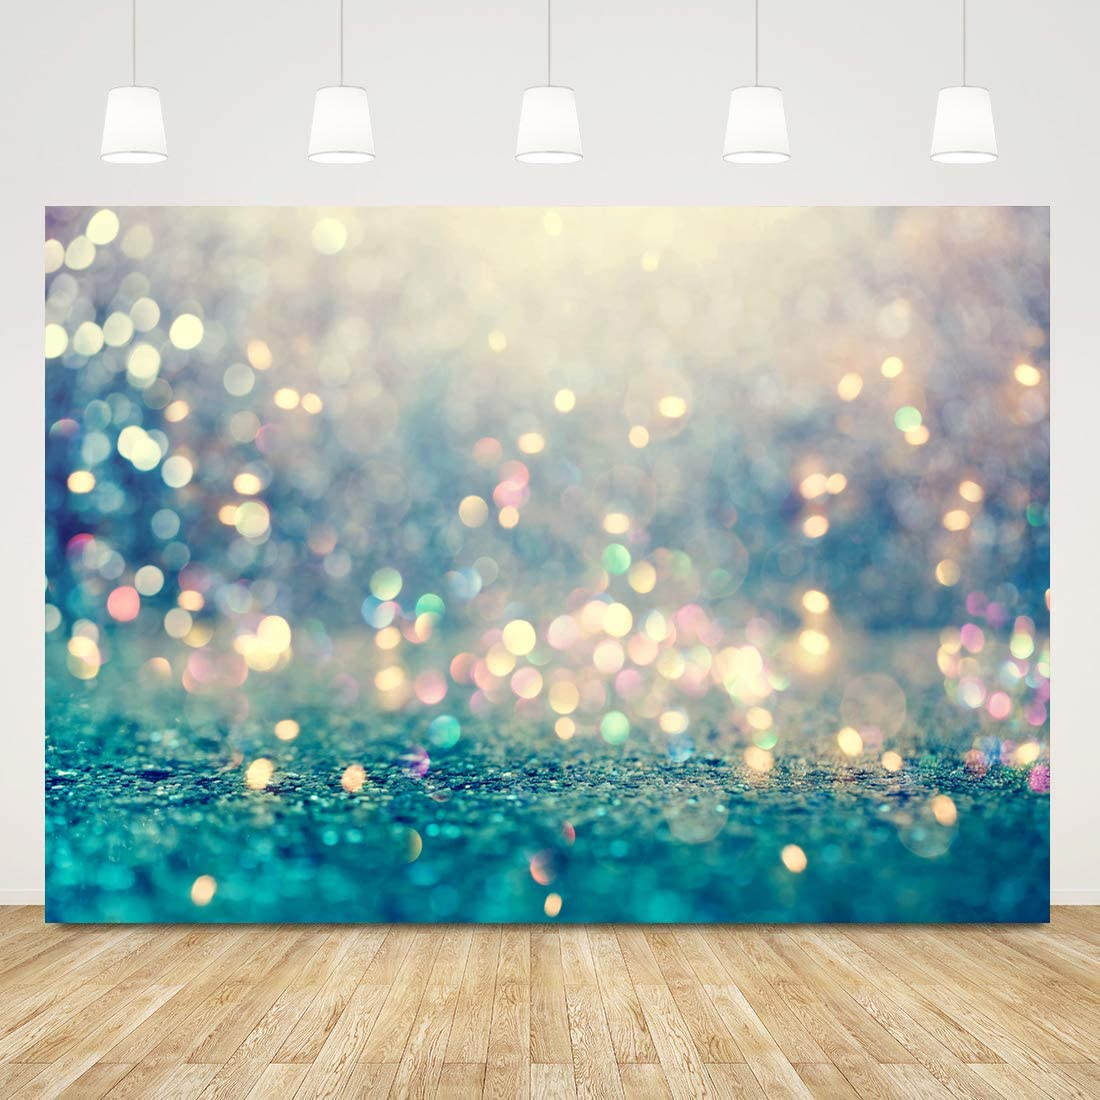 Sensfun Vinyl Photography Background Sparkle Gold Glitter Teal Bokeh Halos Bridal Shower Party Decor Photo Backdrop Baby Portrait Studio Props 10ftx6.5ft